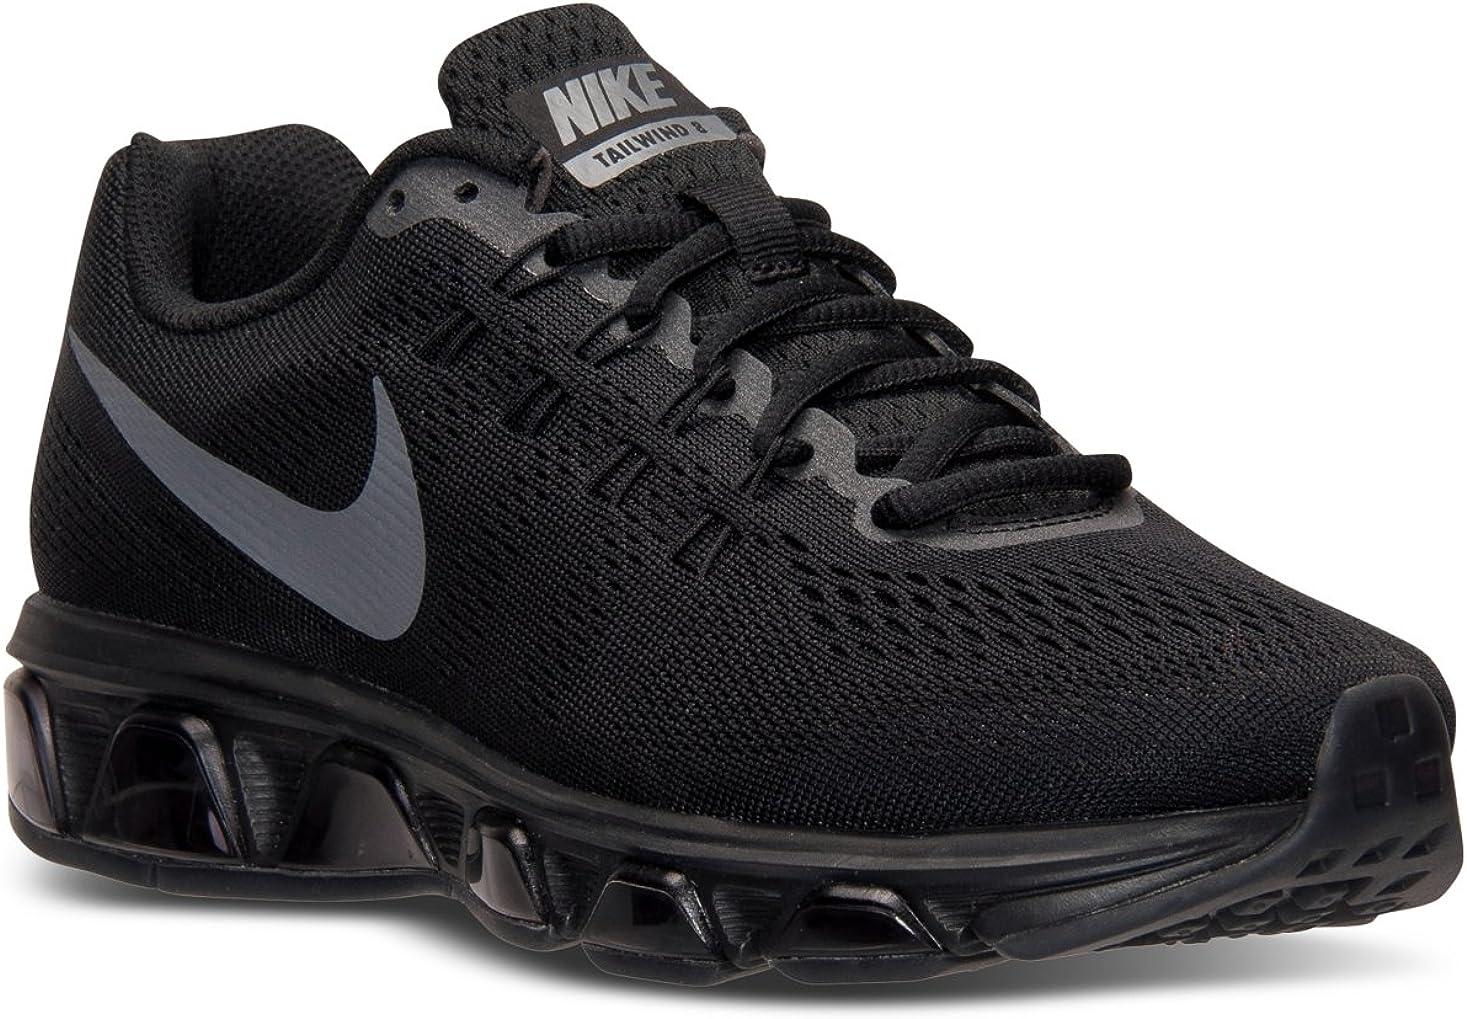 Nike Air Max Tailwind 8 Black/Dark Grey